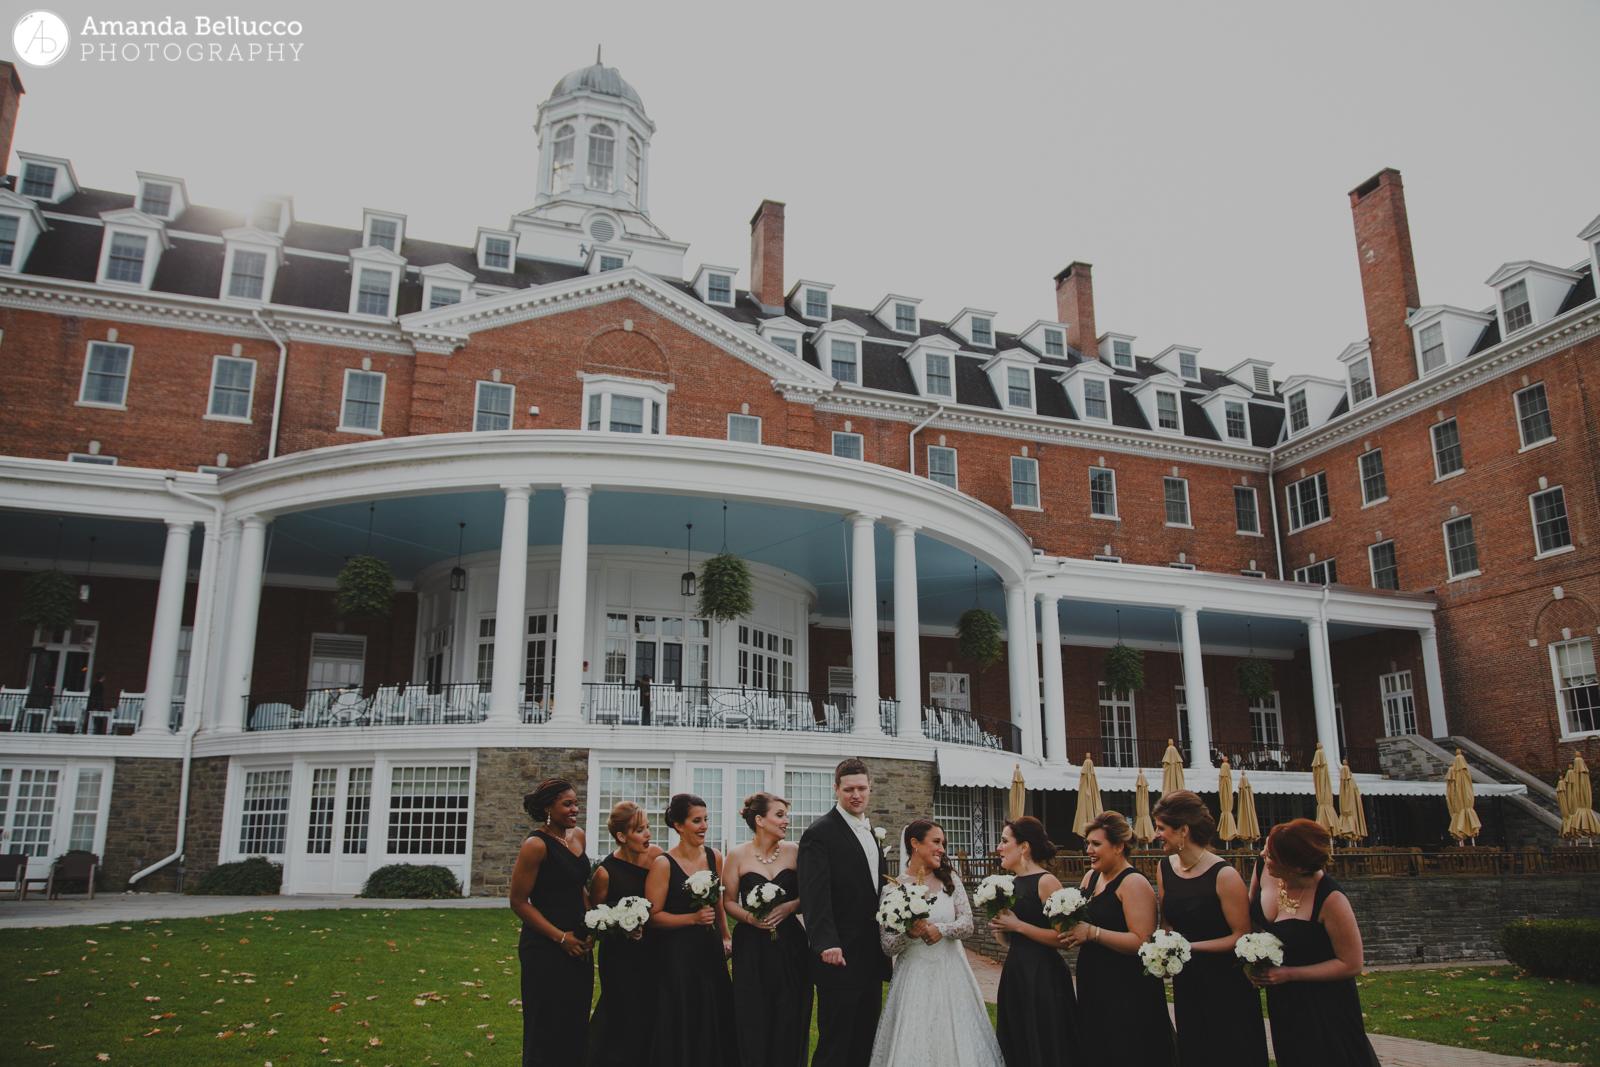 syracuse-rochester-fine-art-wedding-photographer-57.JPG